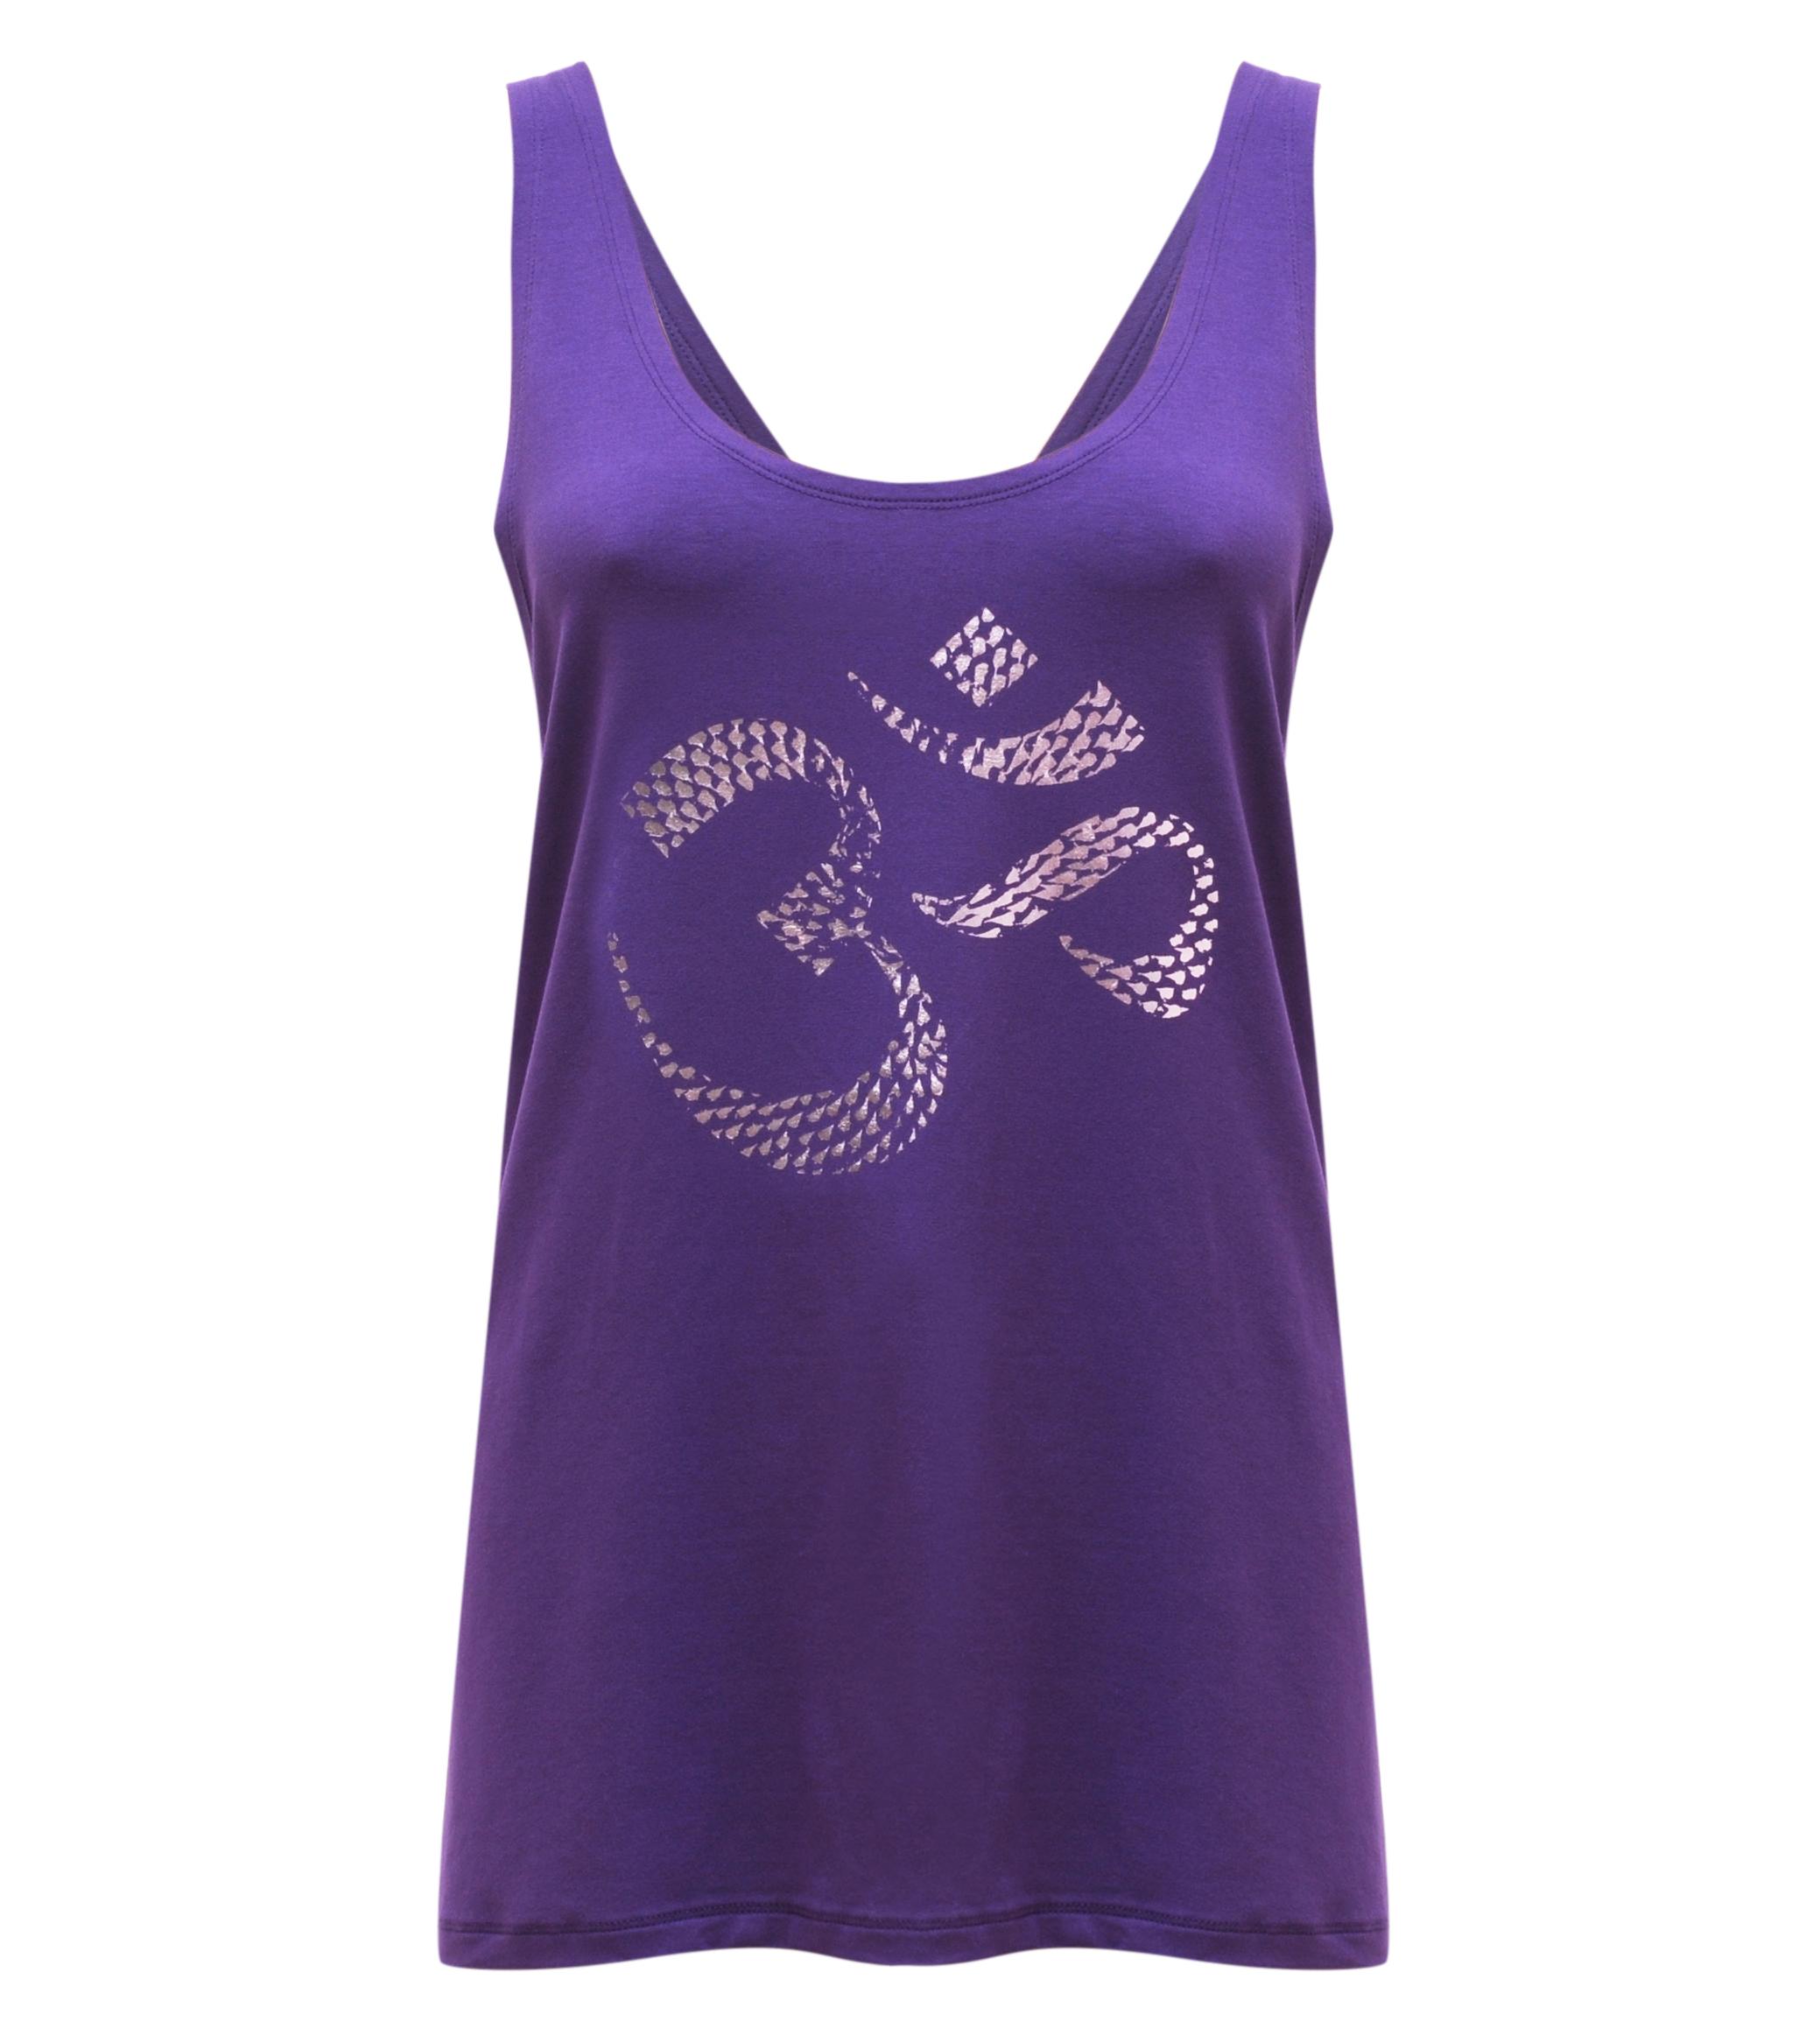 "Yoga-Tank-Top ""OM"" - purple"